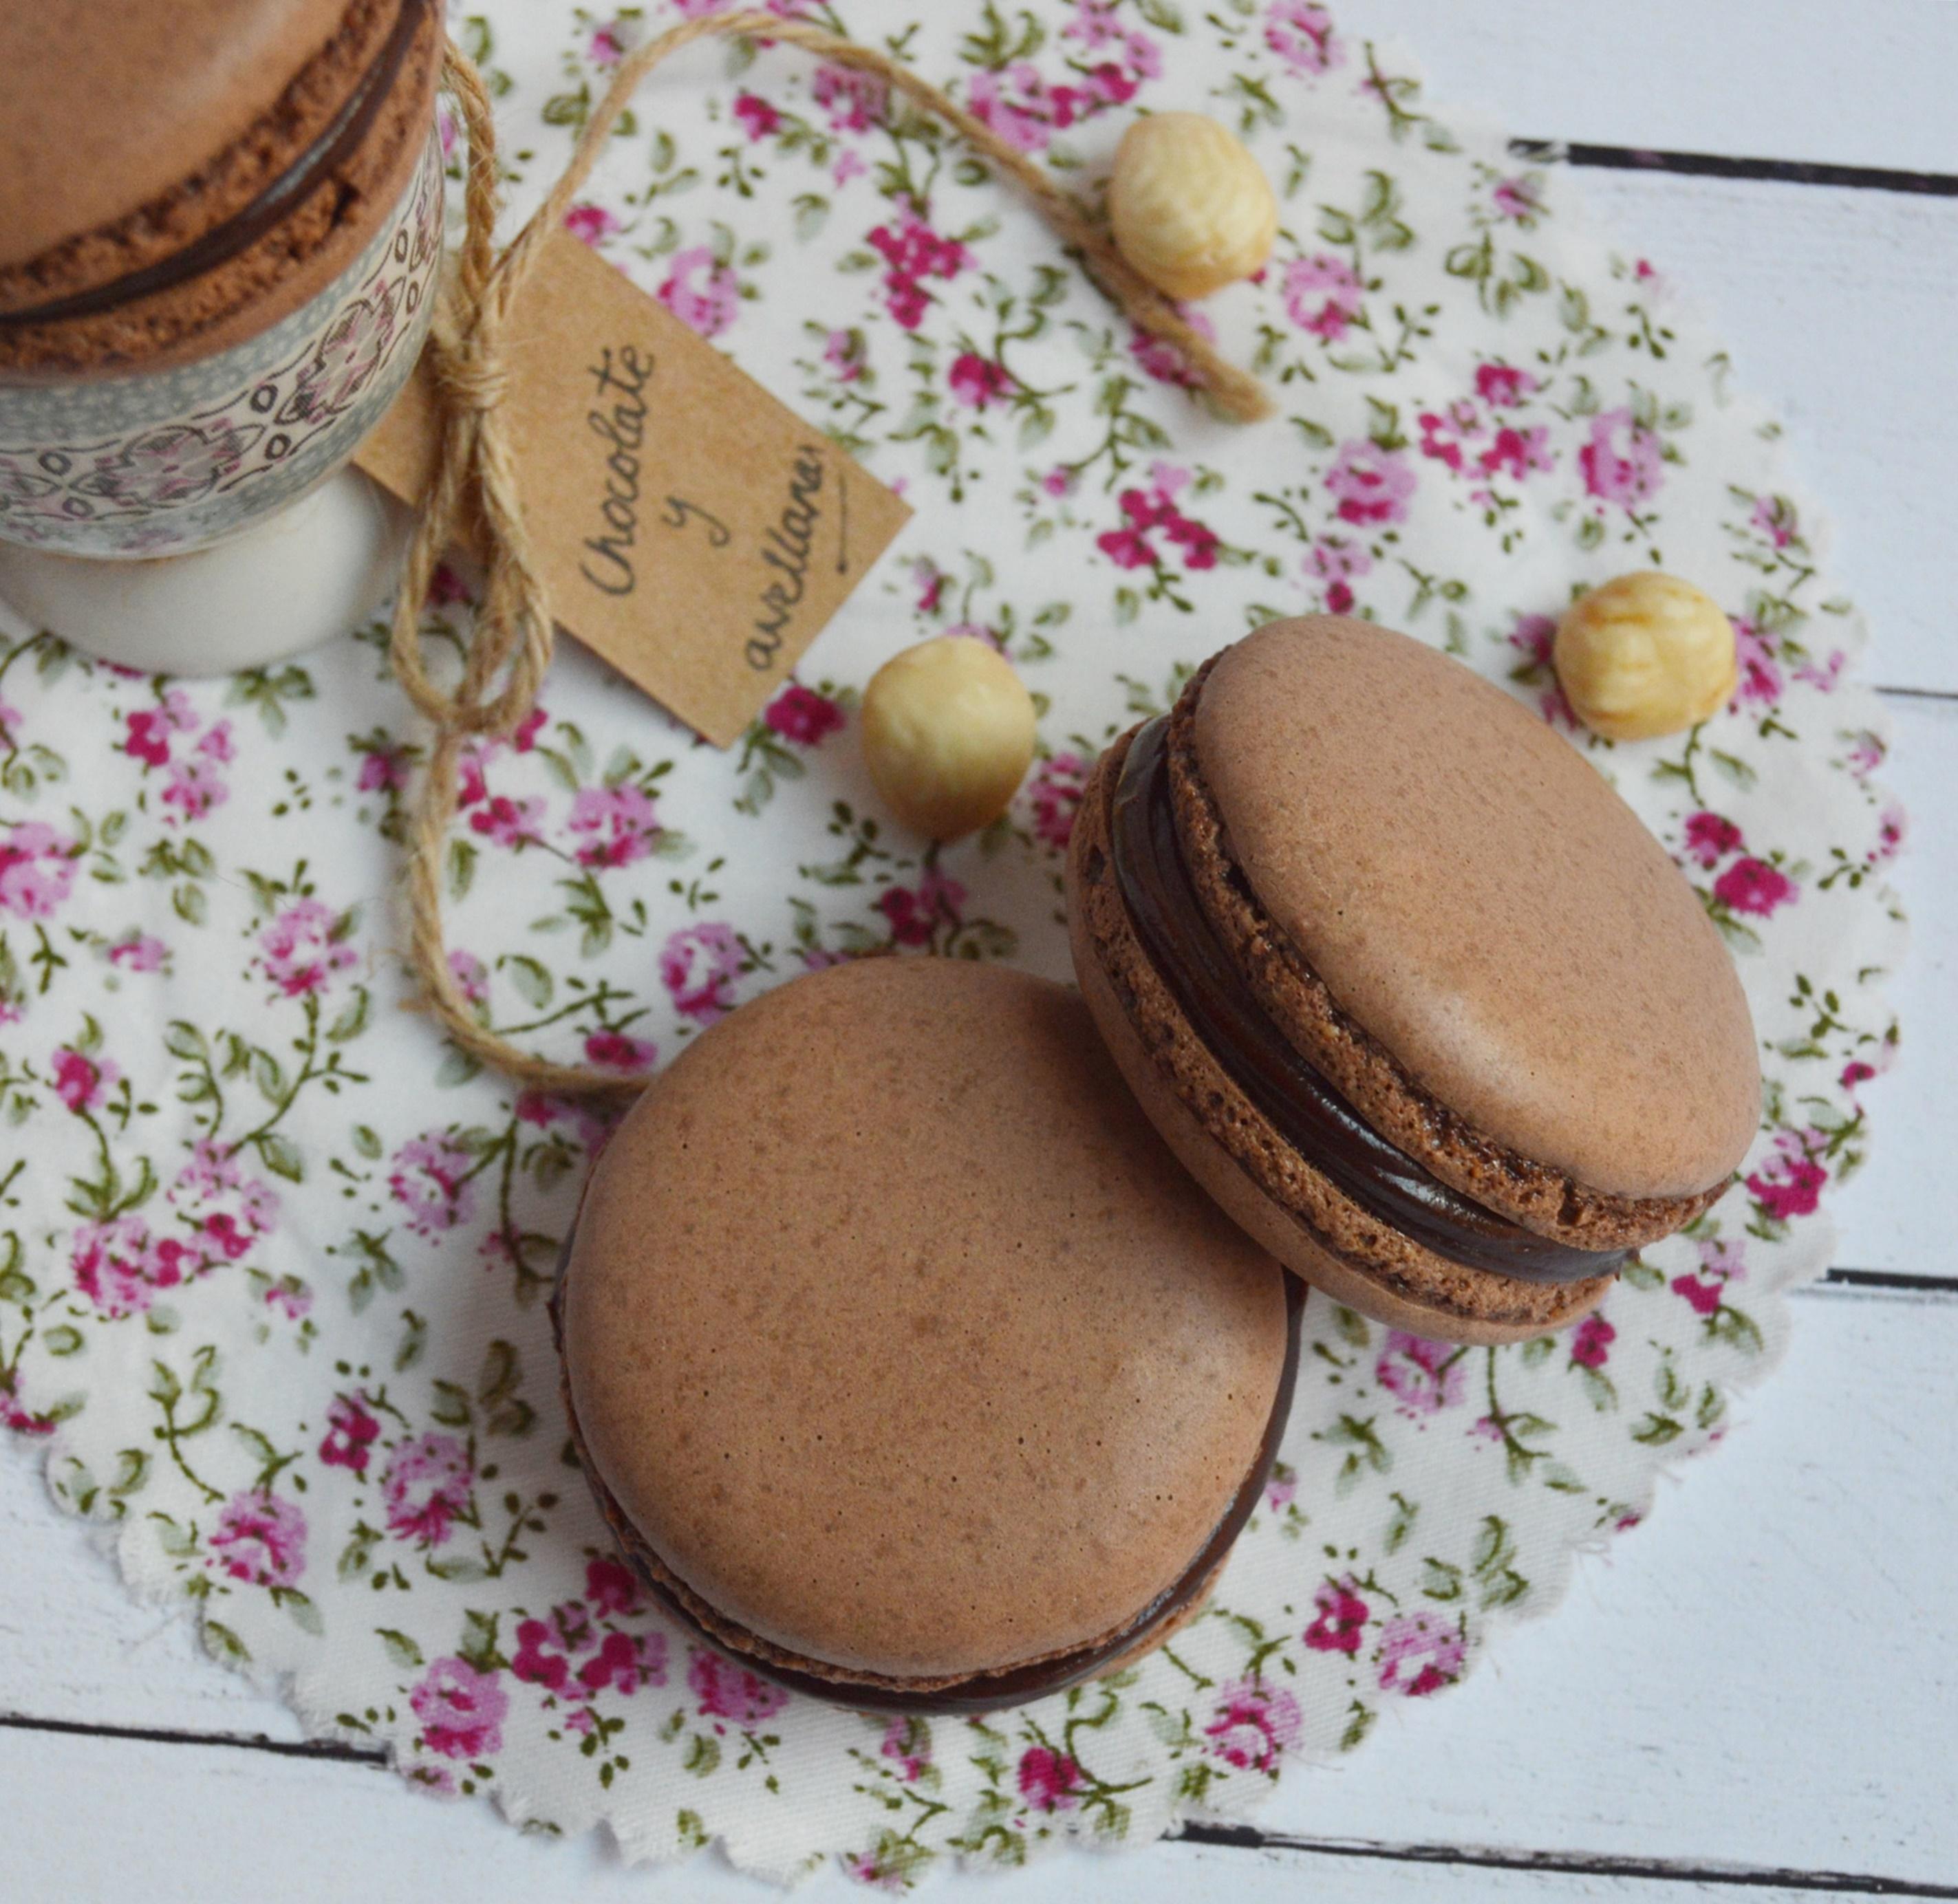 Macarons de chocolate y avellanas. Aroma de chocolate